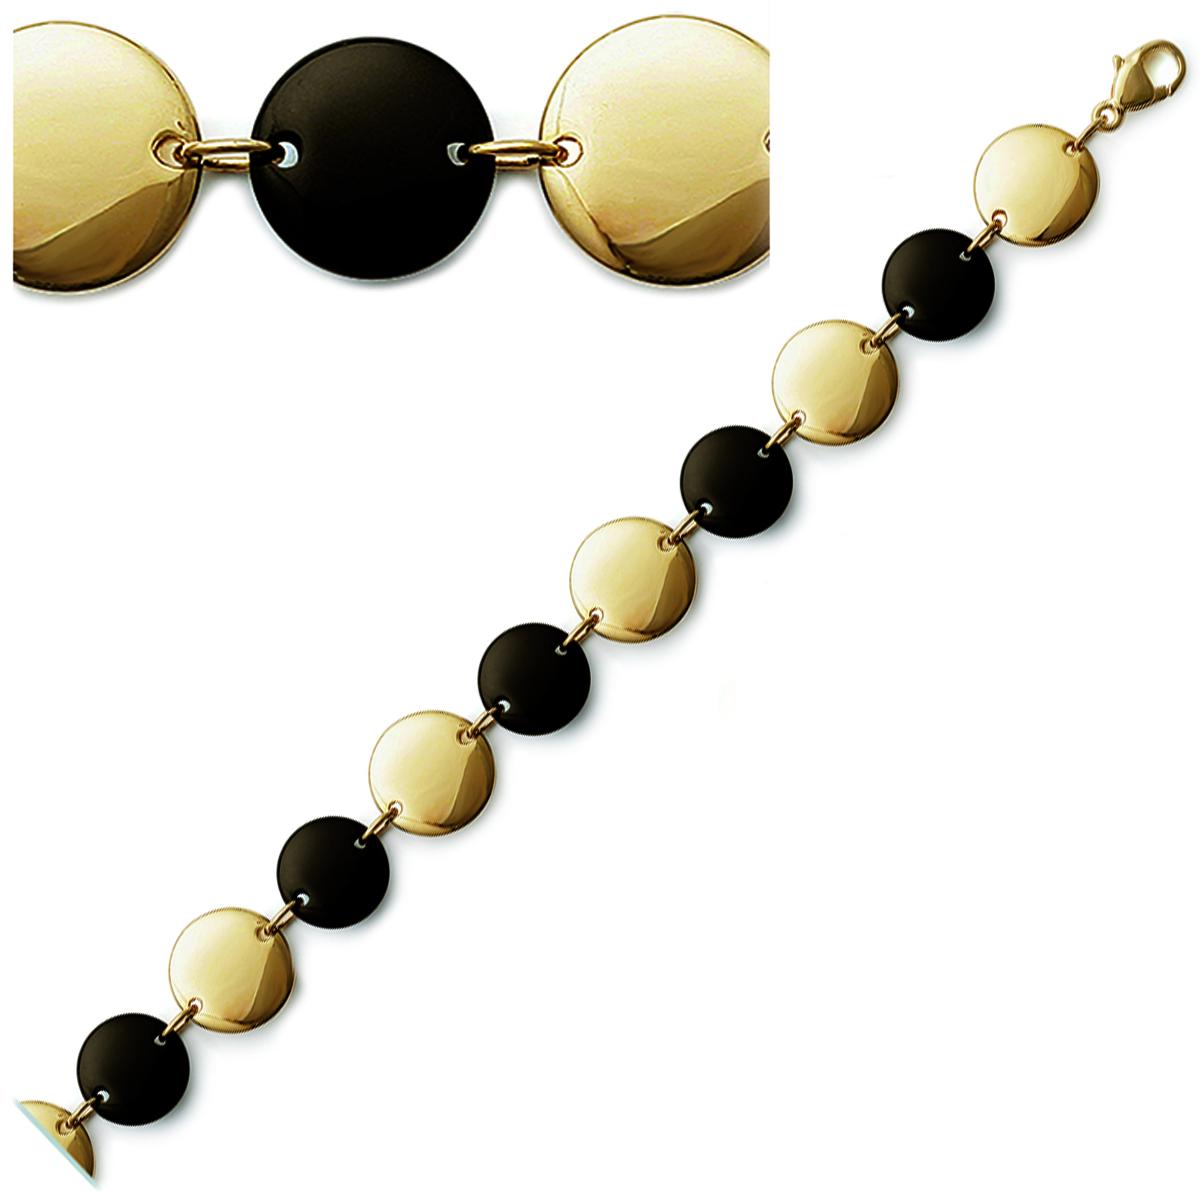 Bracelet Plaqué or \'Calypso\' onyx - 19 cm 15 mm - [J3852]